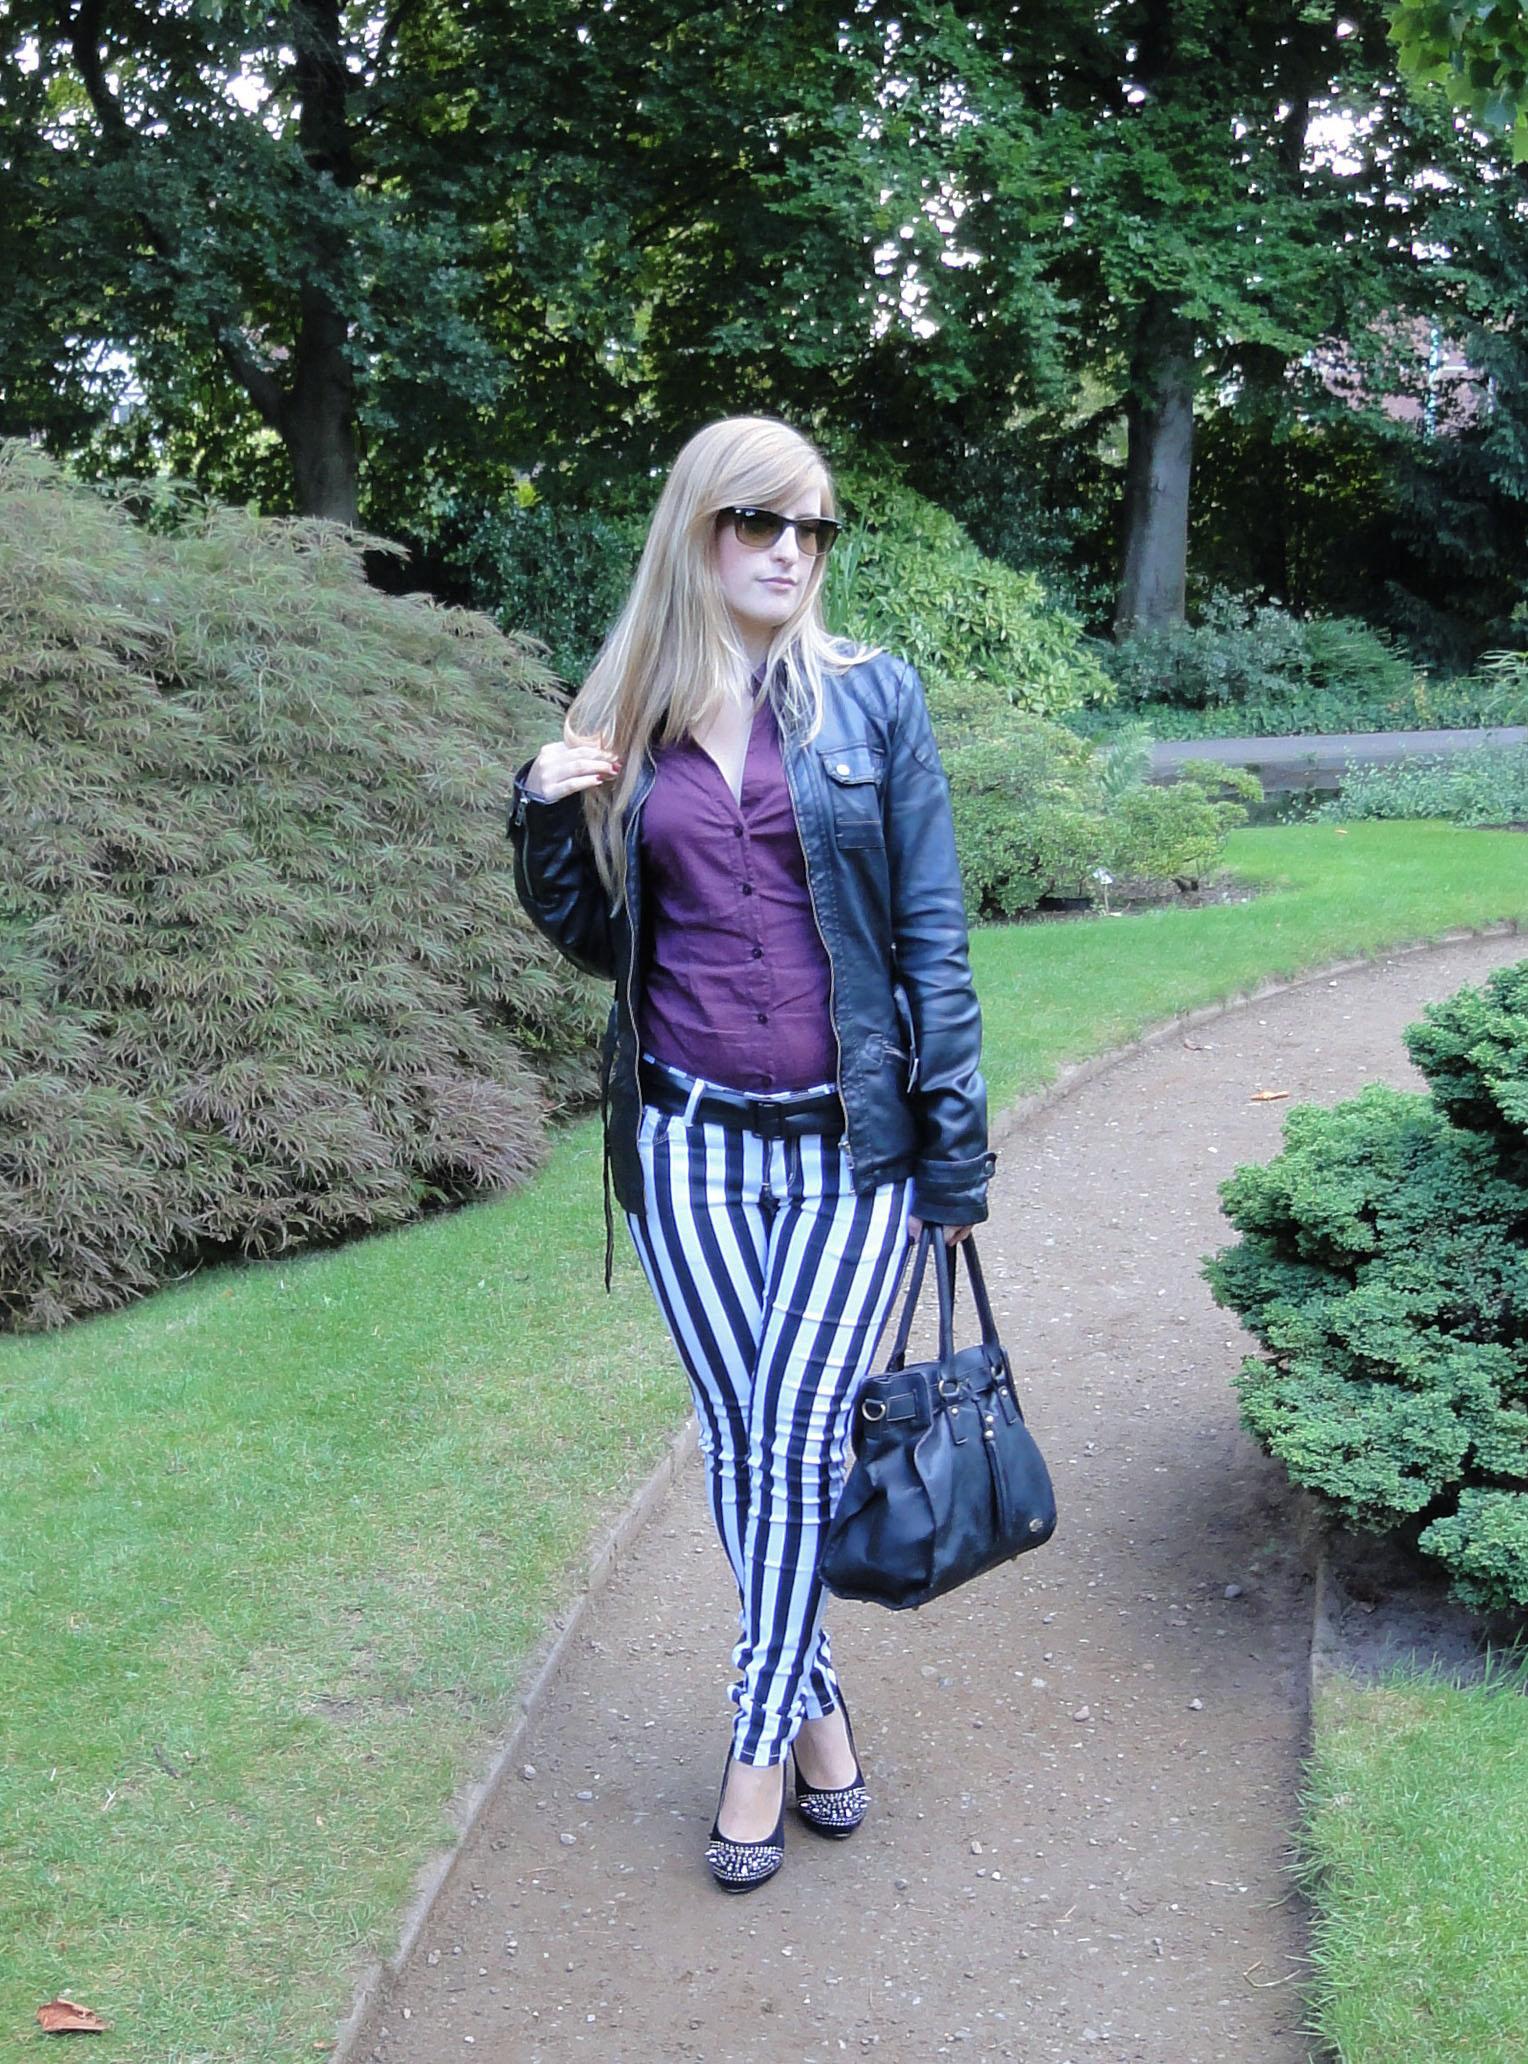 Stripes Rules Modeblog schwarz weiß gestreifte Hose kombinieren streifen Outfit schwarze Lederjacke jajpanischer Garten 3